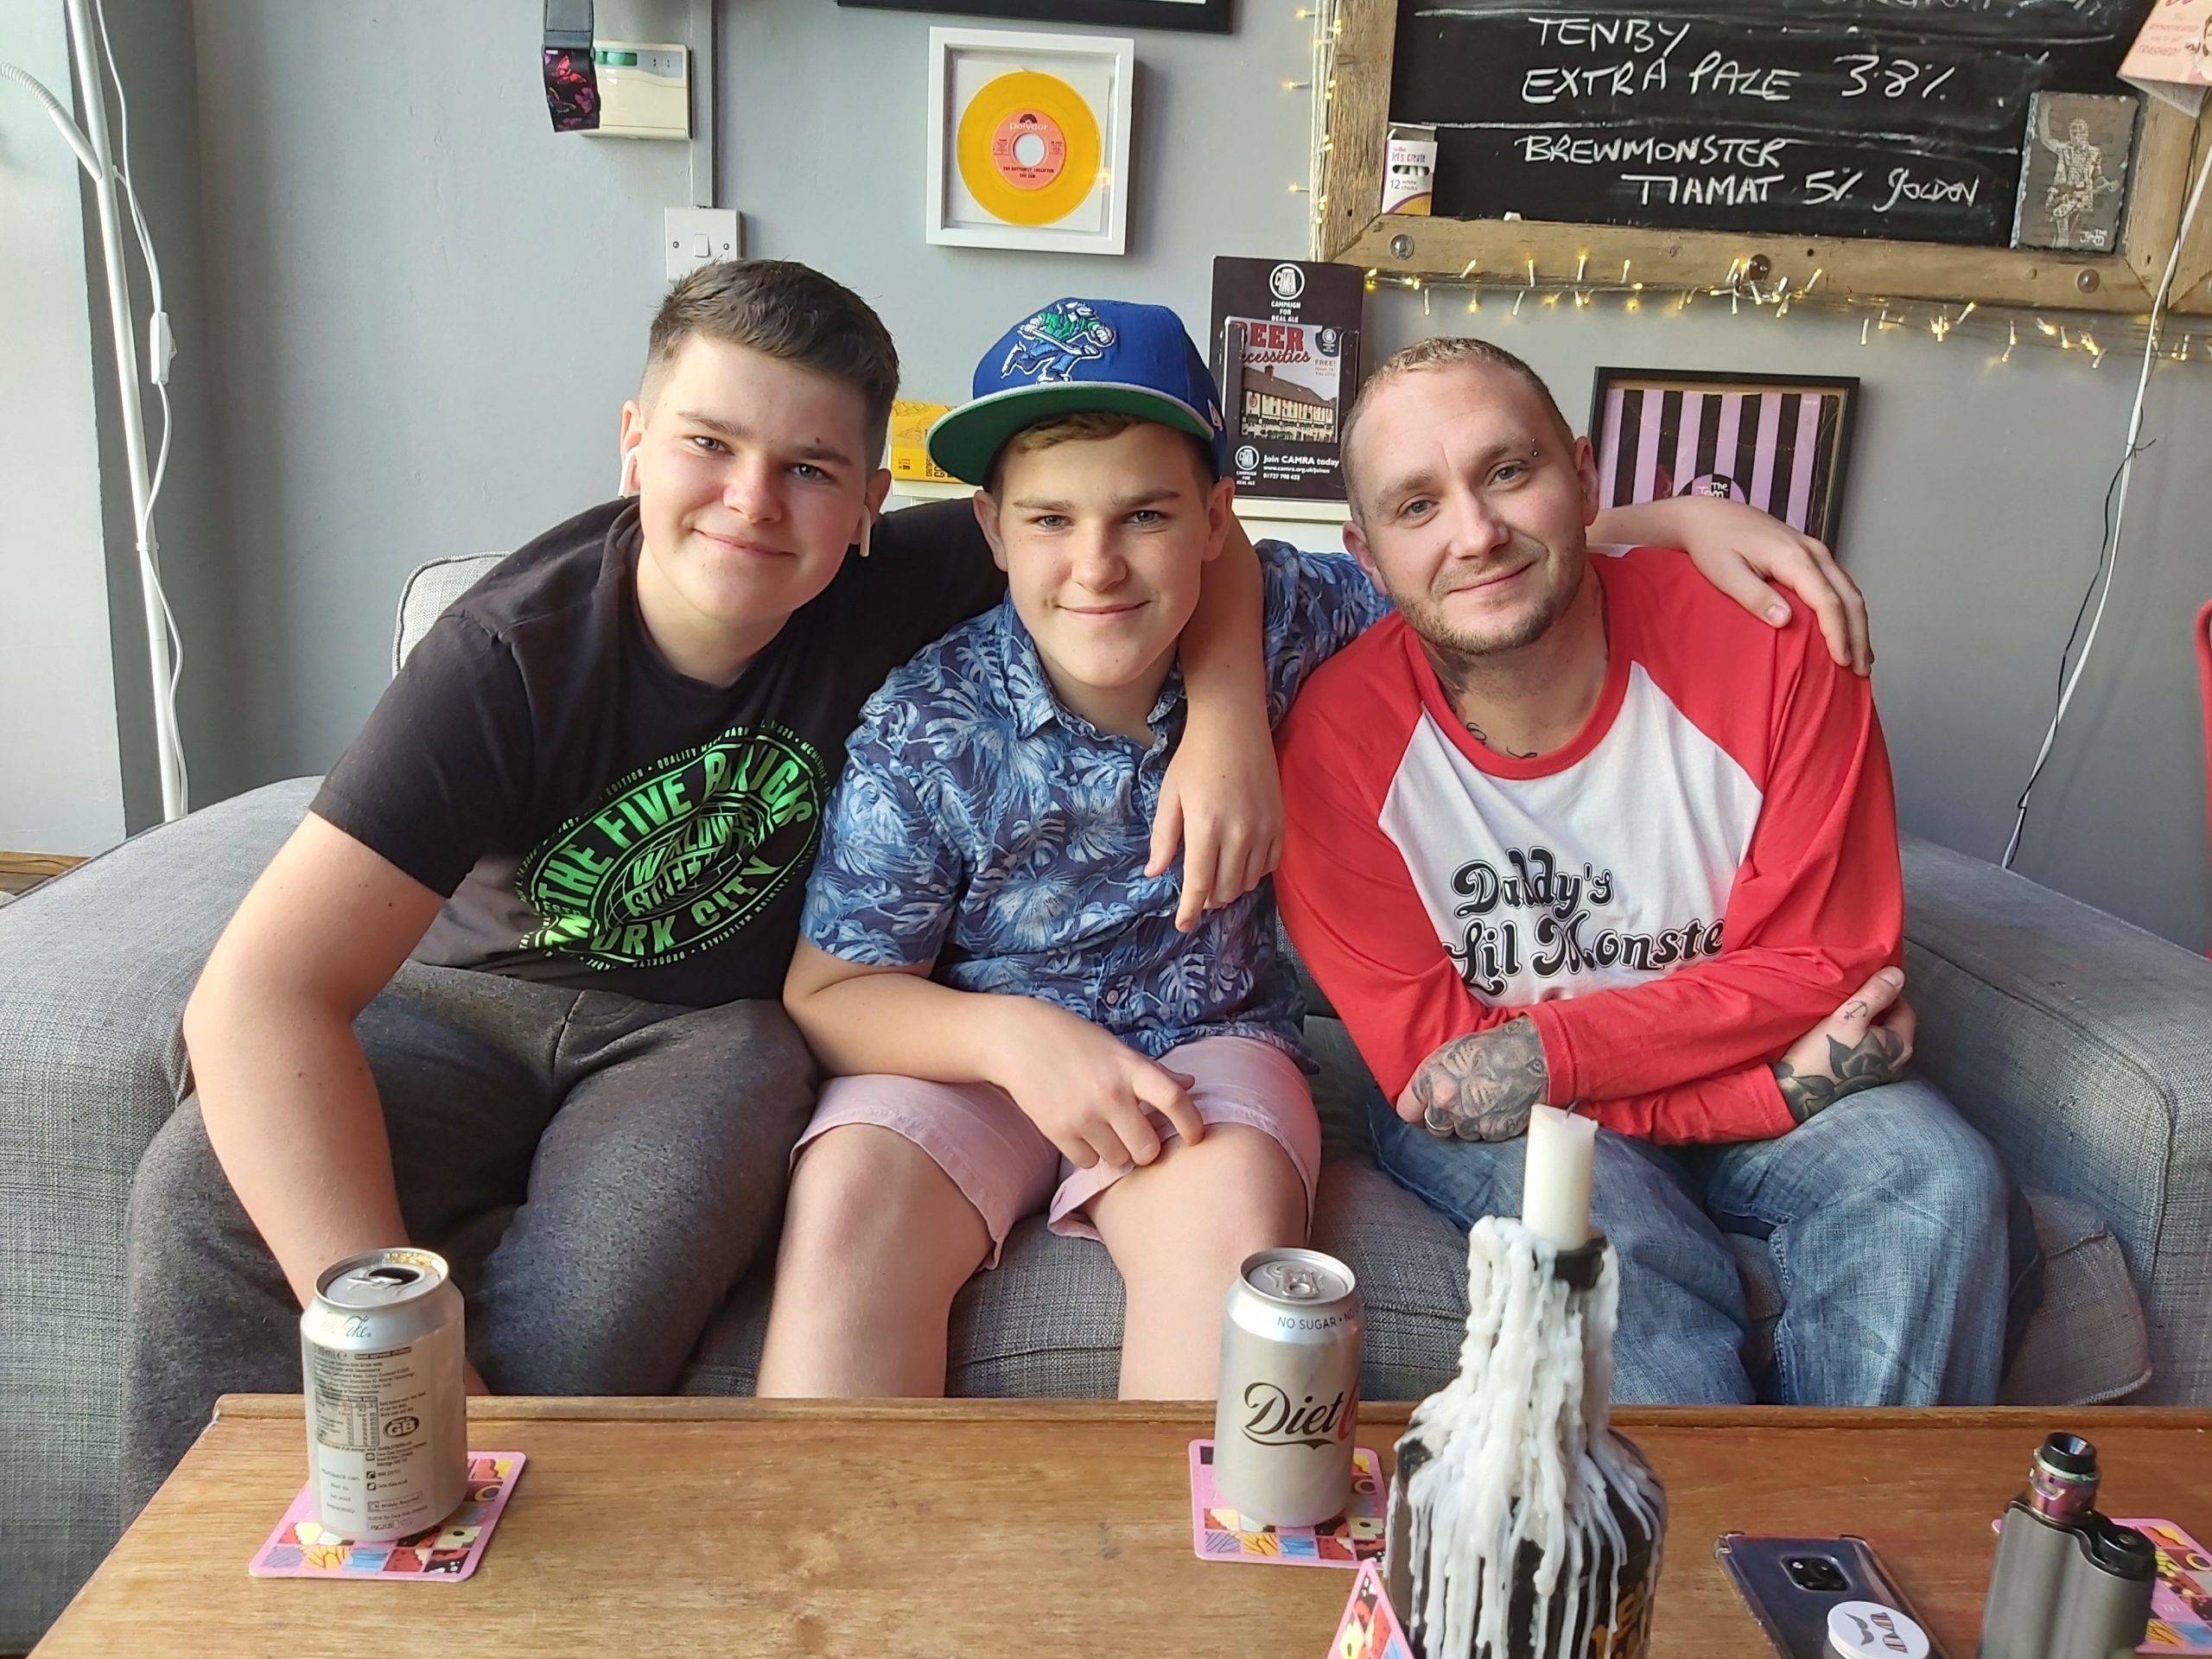 Zak, Dan and Jon